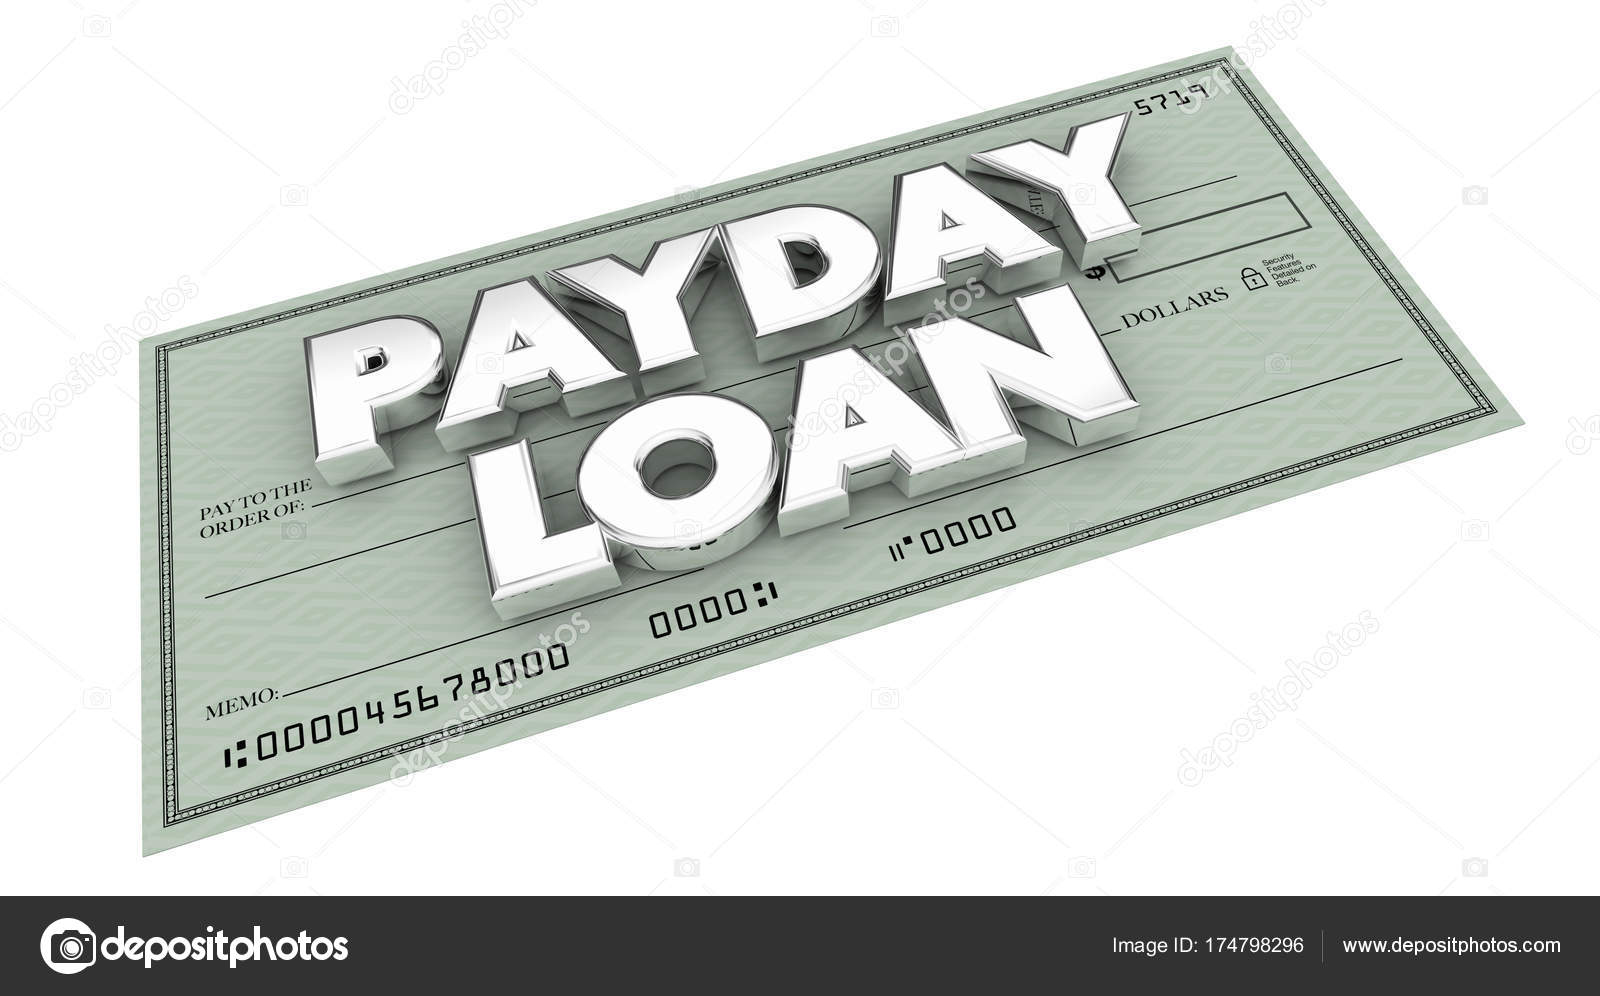 Usa payday loans crestwood il image 9